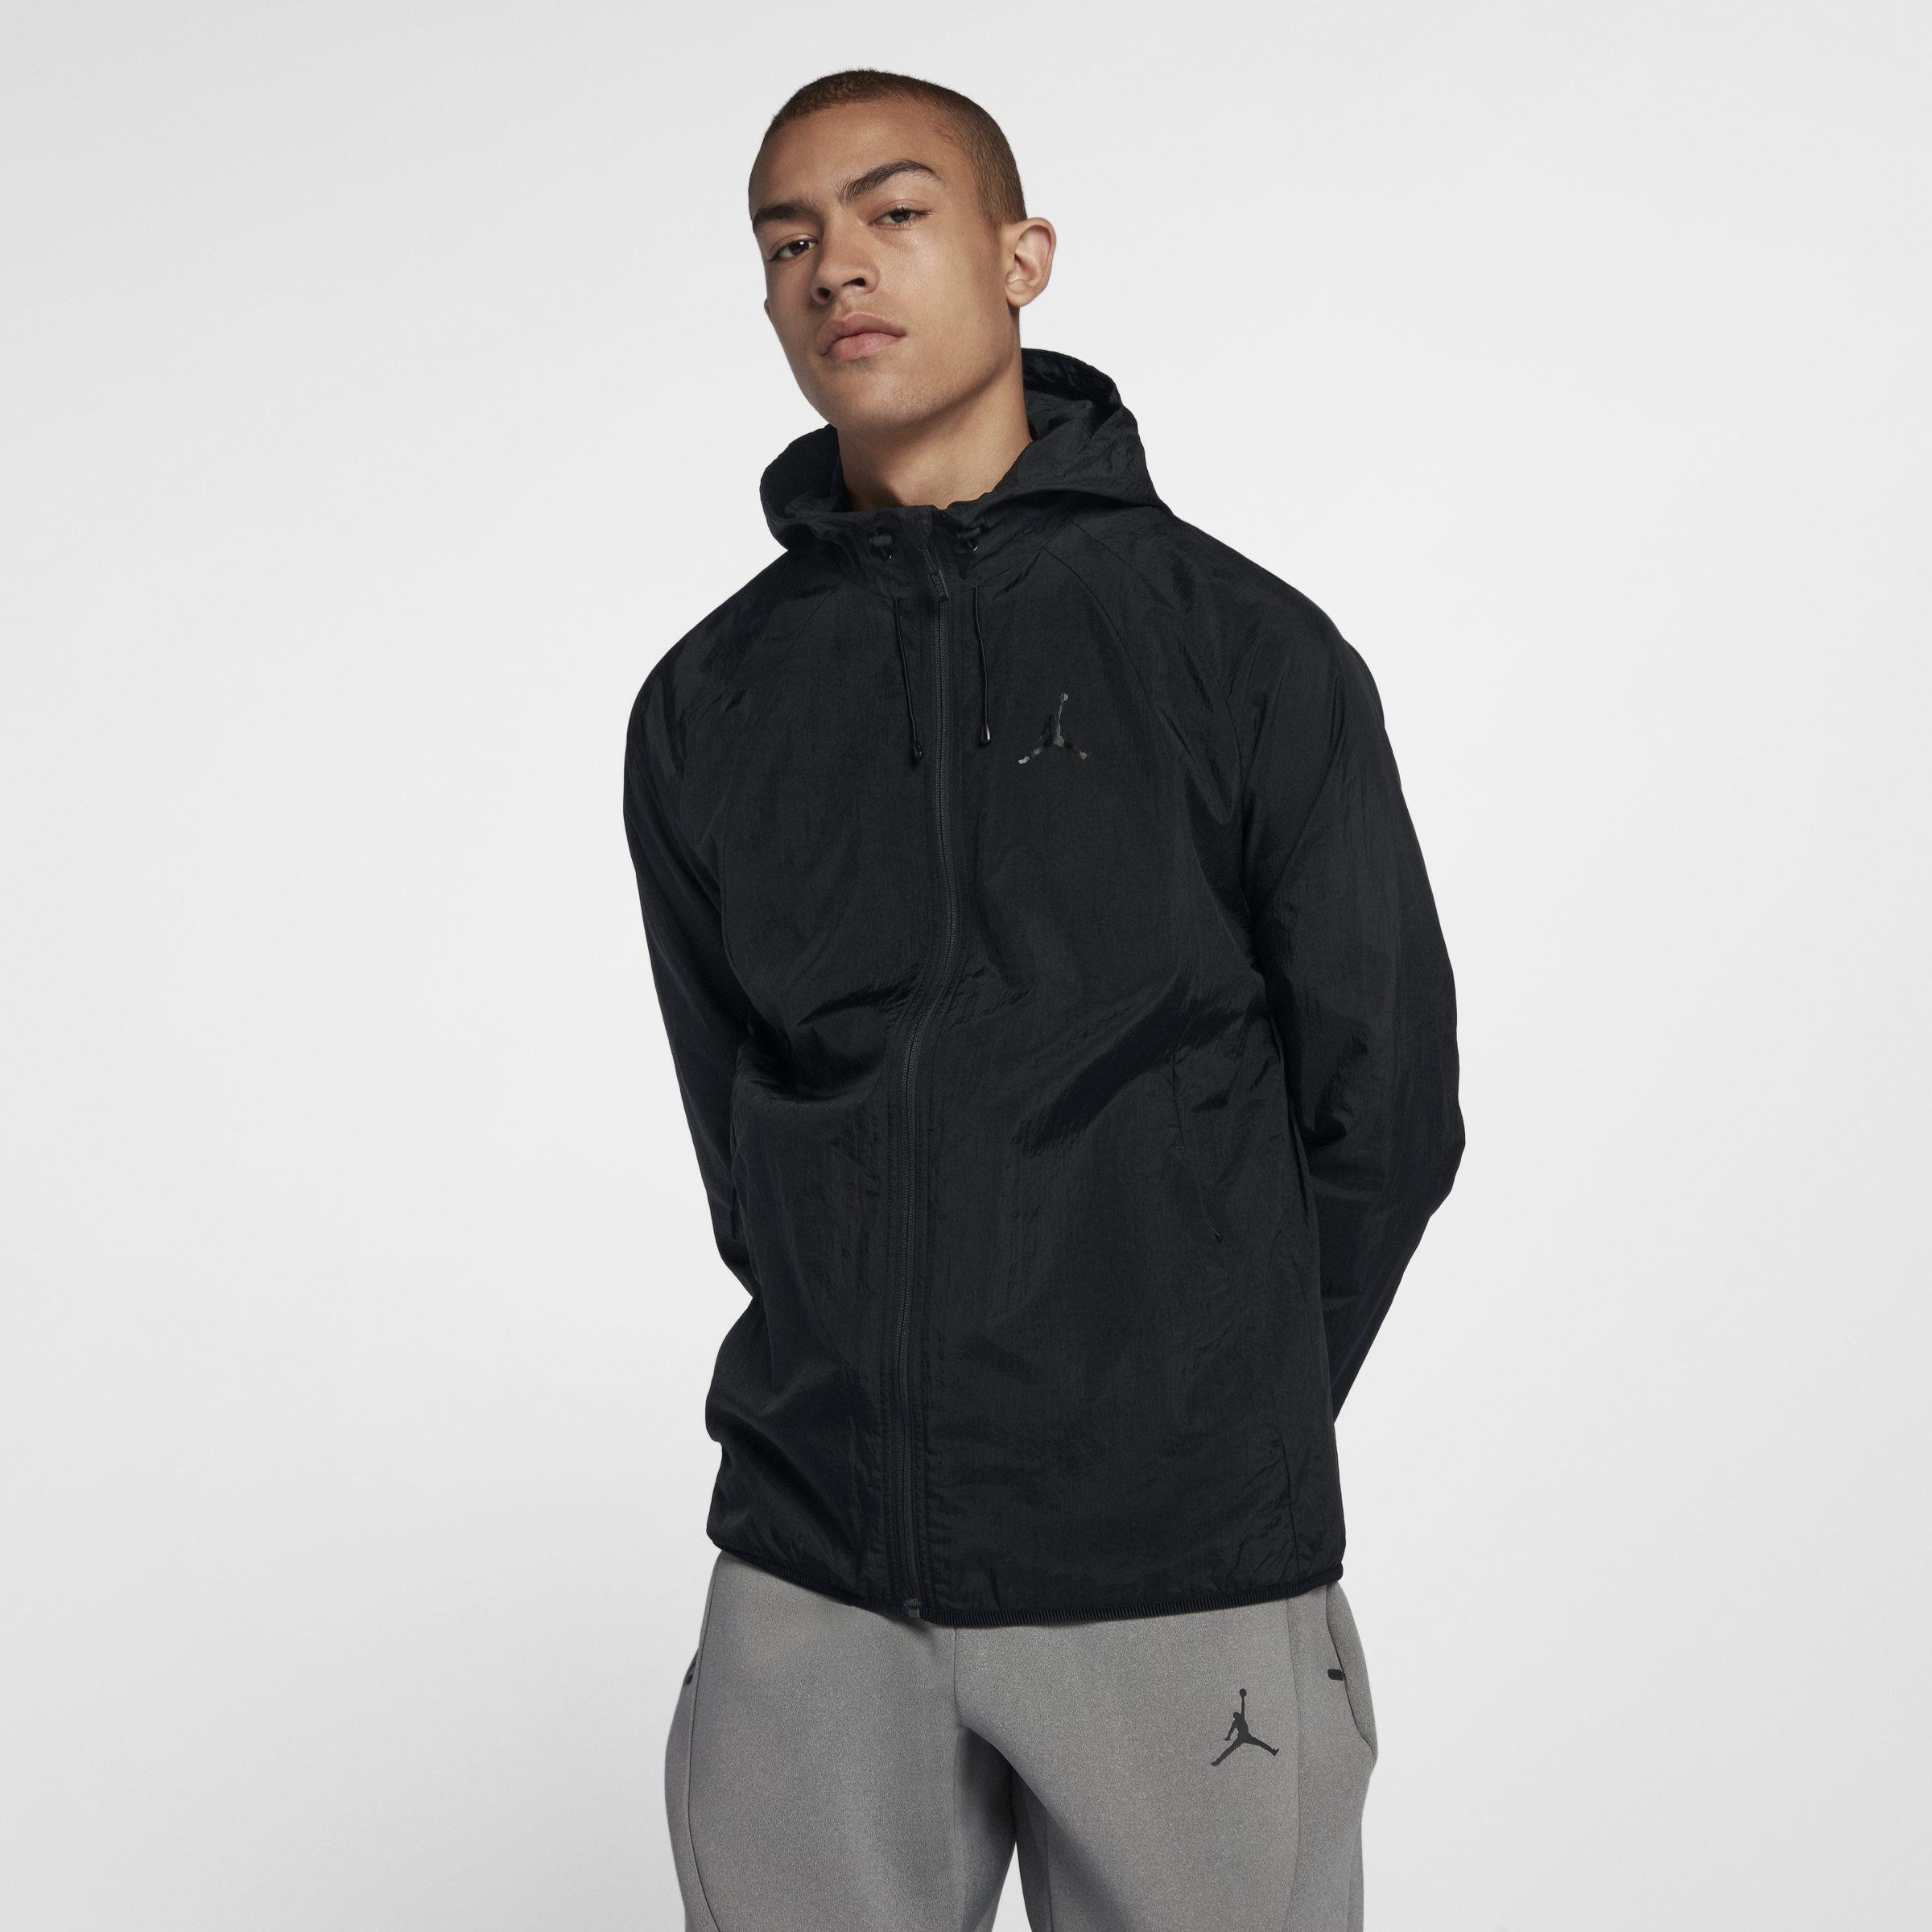 ff7d4b7c1ae6 Nike Jordan Lifestyle Wings Windbreaker Jacket in Black for Men - Lyst